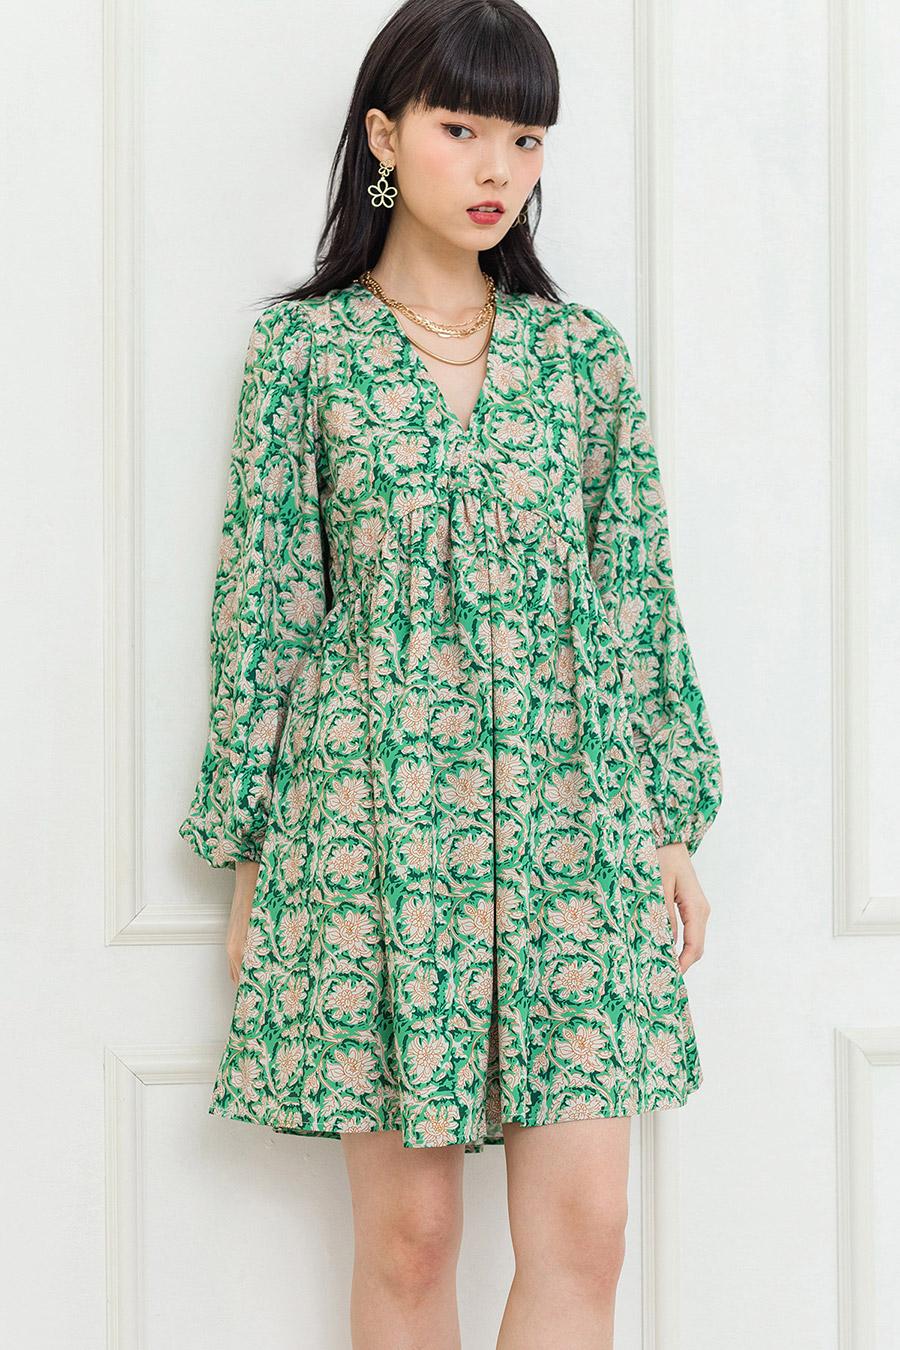 *RESTOCKED* PAZIAH DRESS - PINE FLEUR